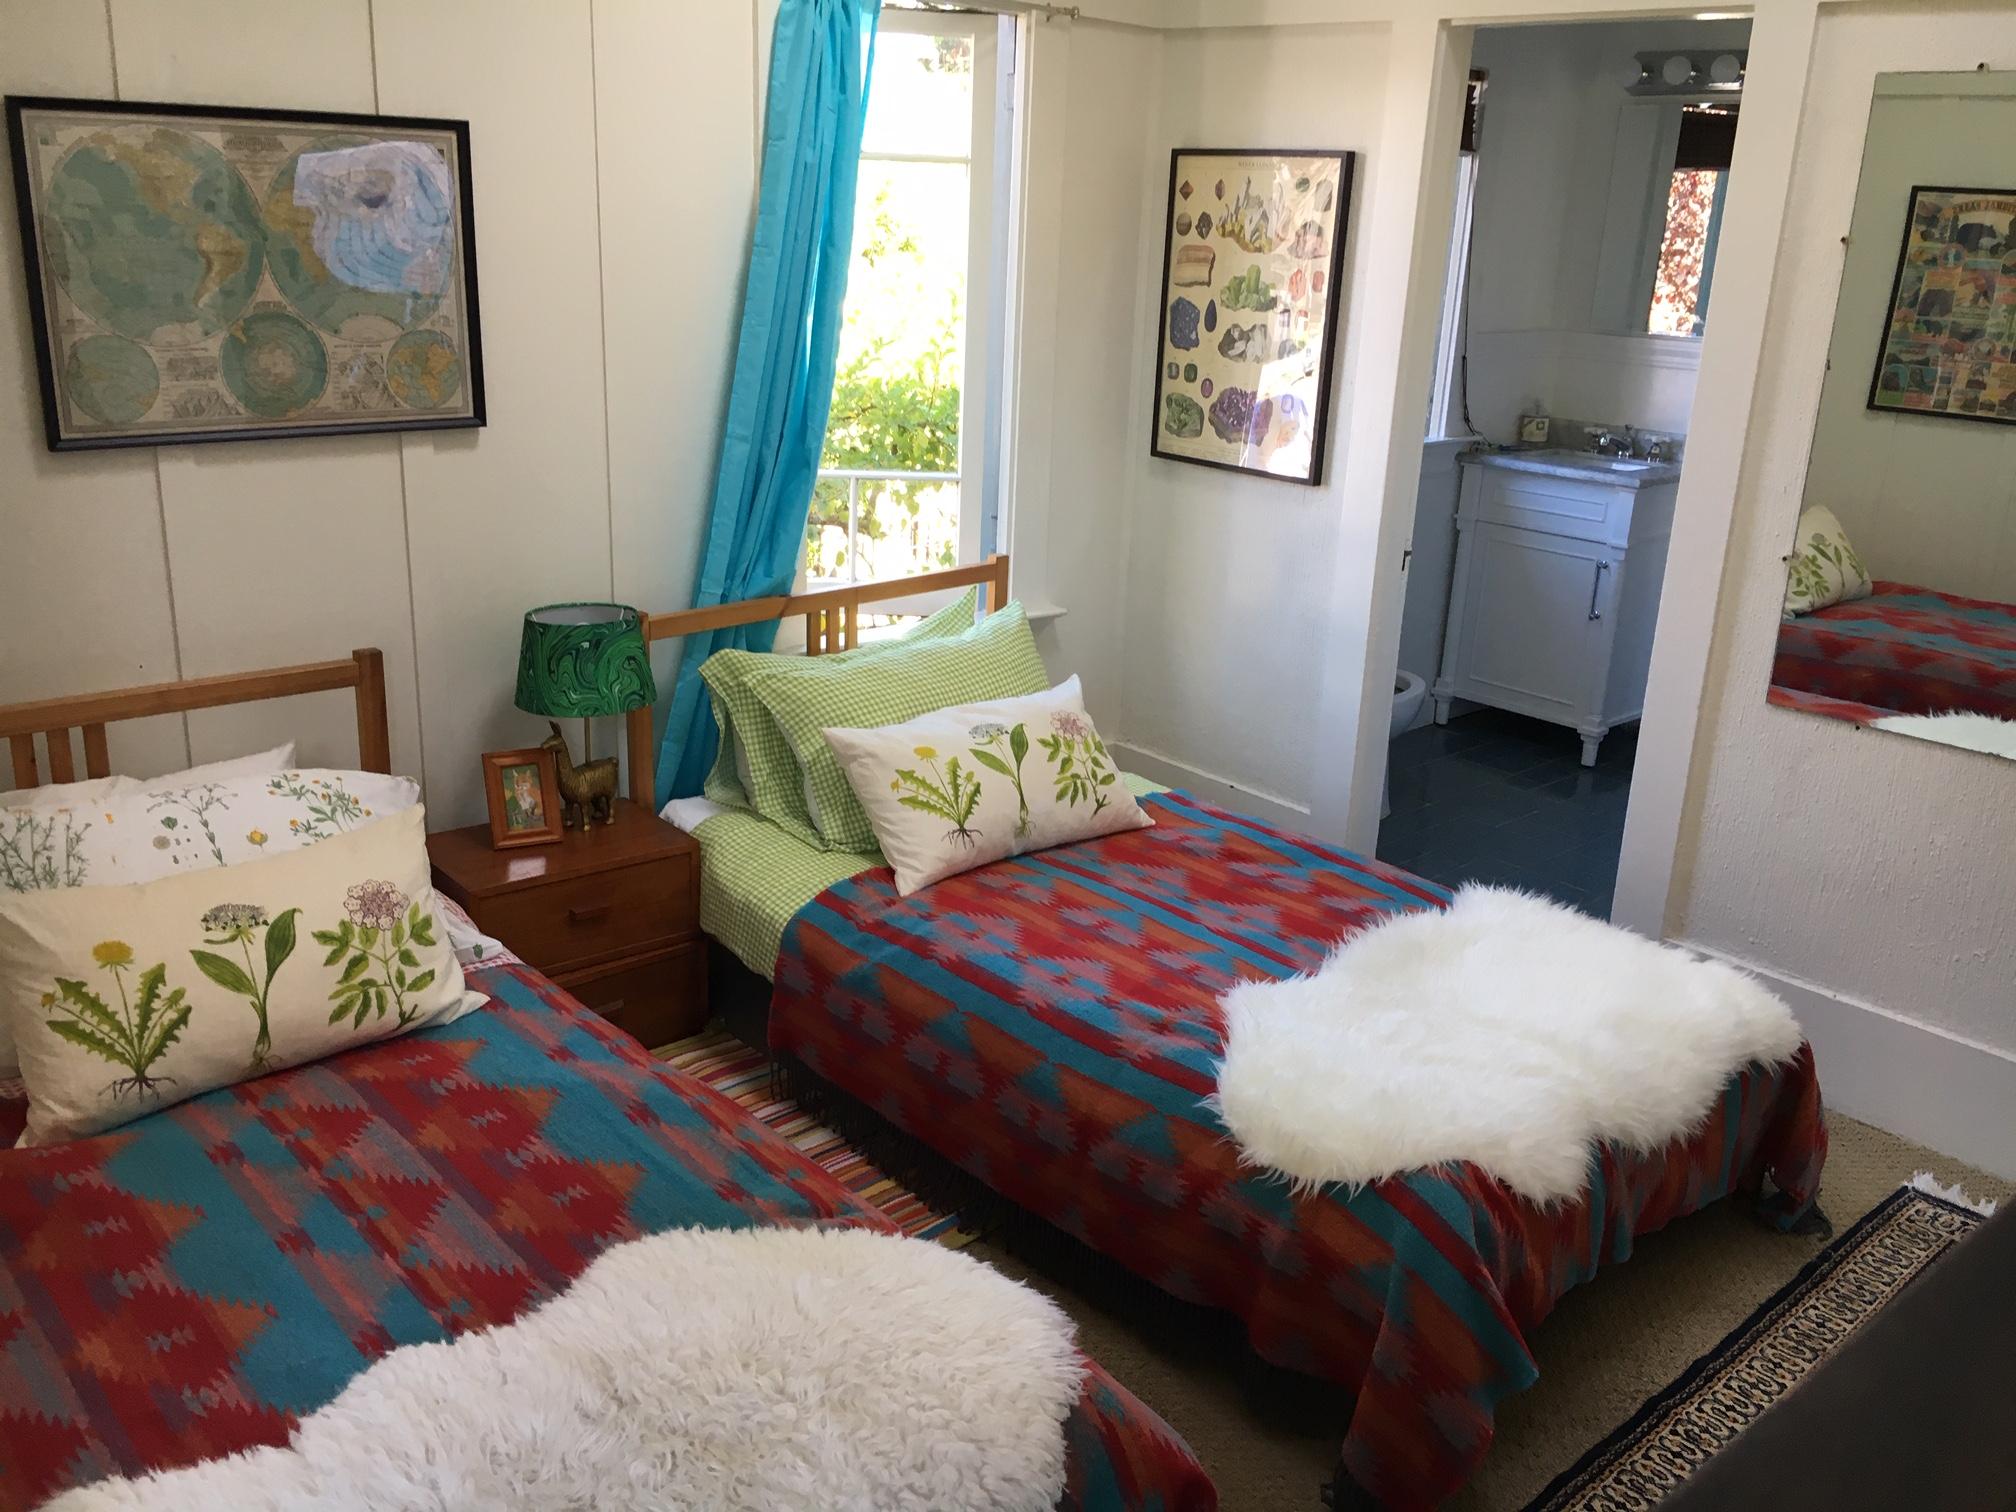 frontbedroom-beds.jpeg